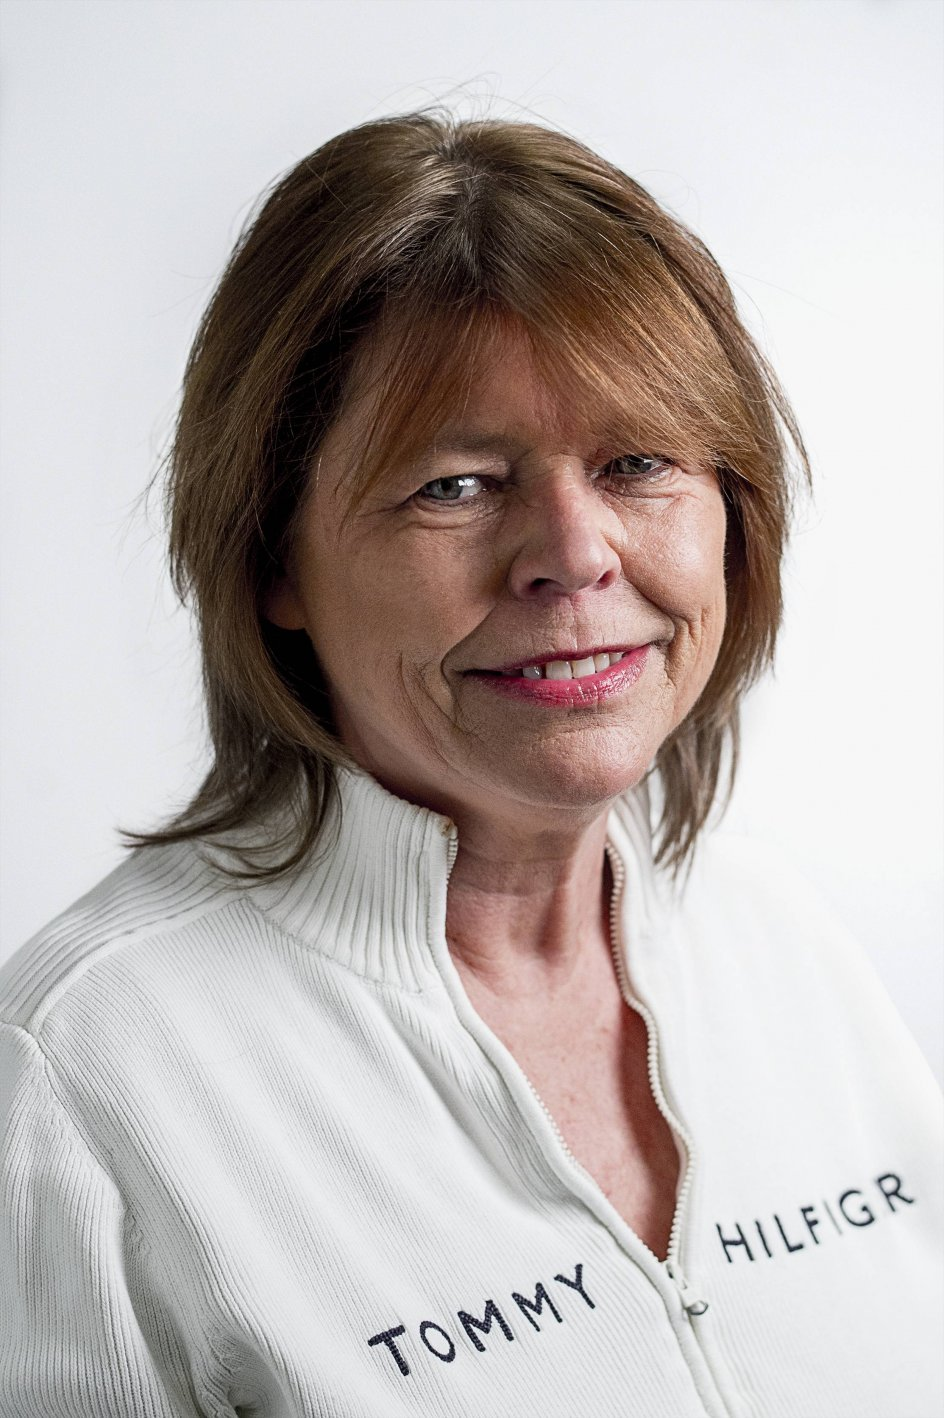 Susanne Utzon